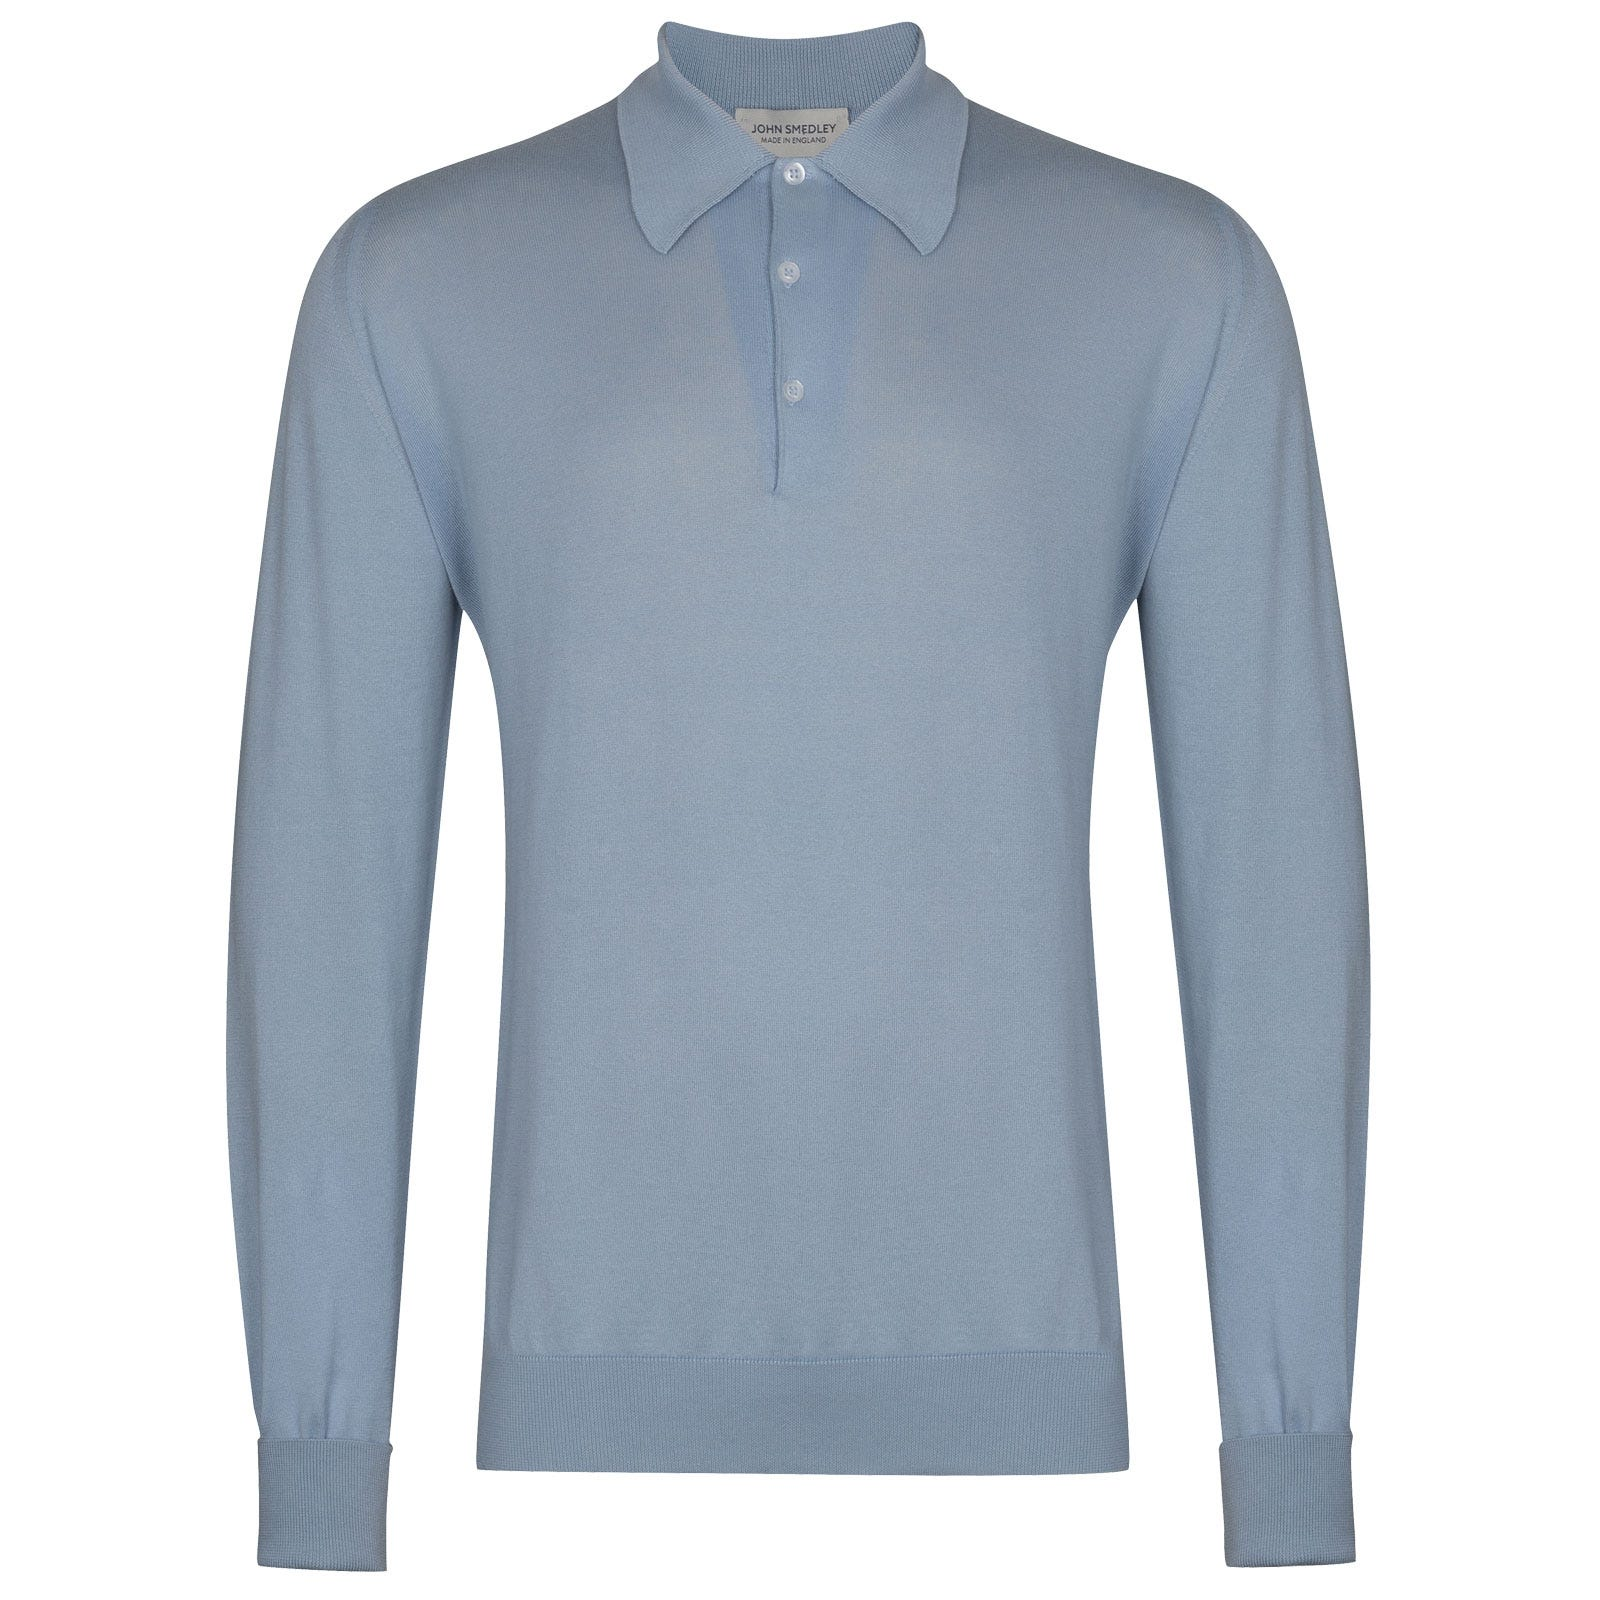 John Smedley Finchley in Dusk Blue Shirt-XSM